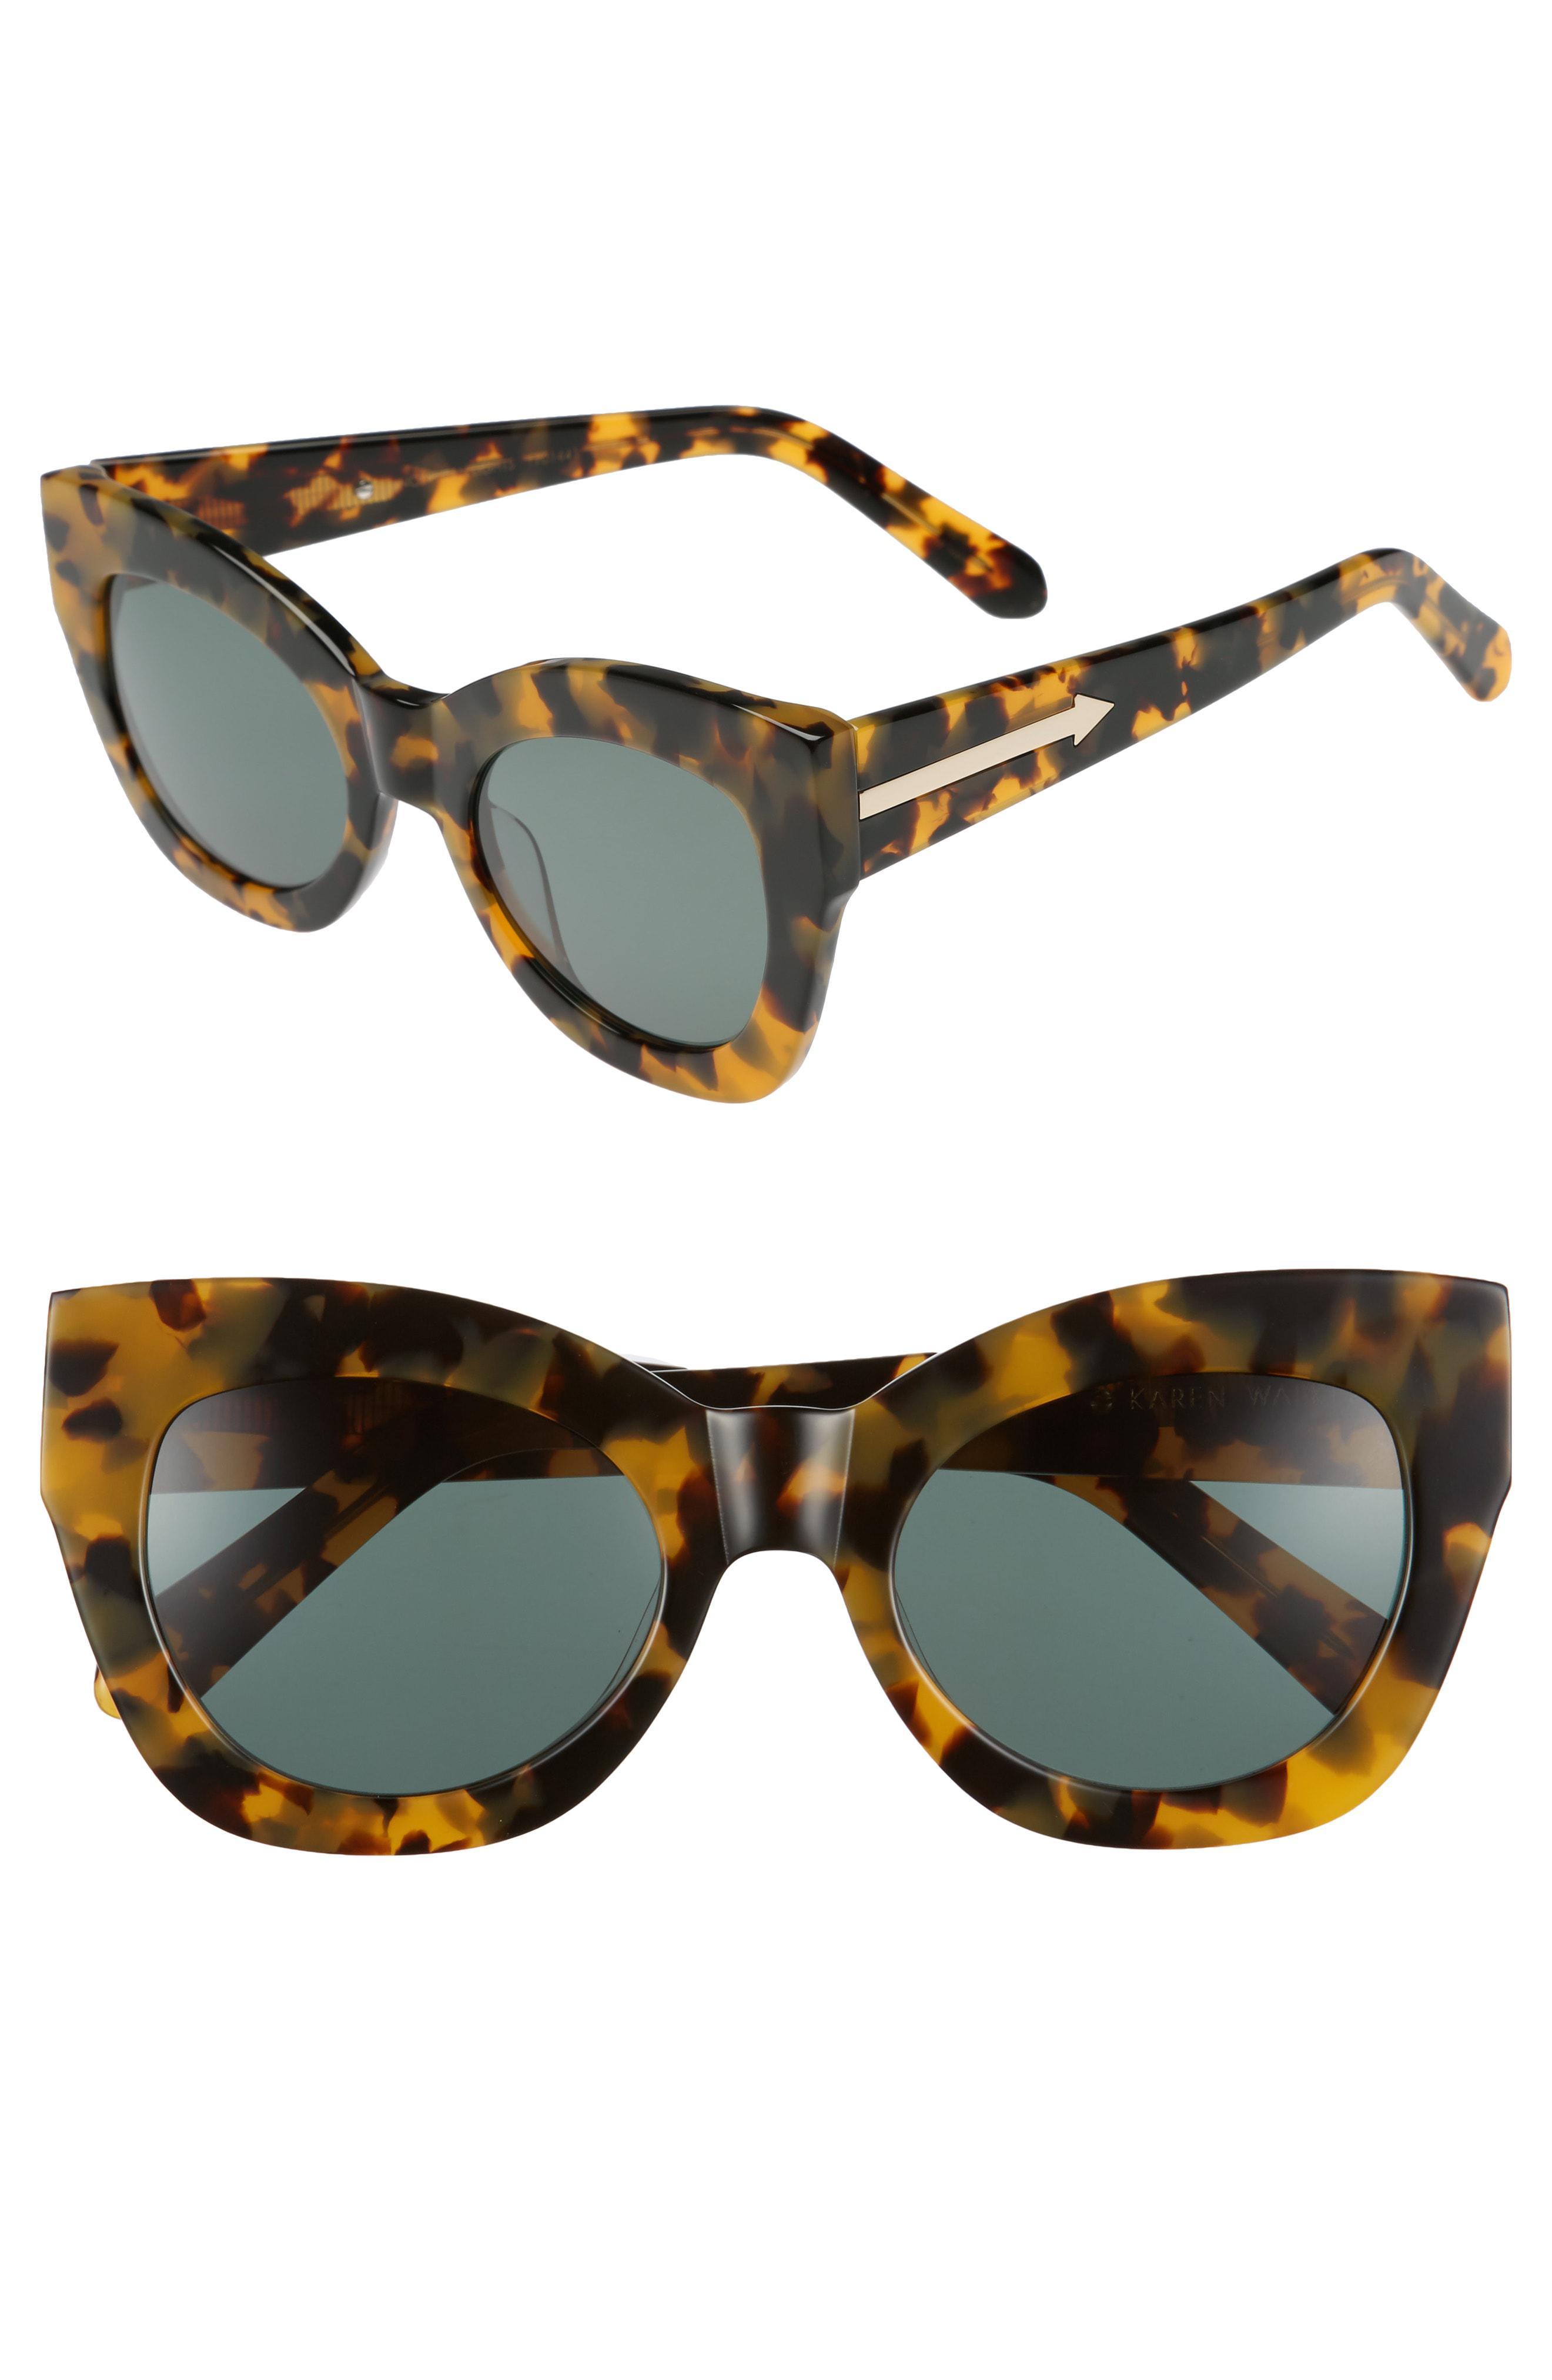 ff7b1da55c4 Lyst - Karen Walker Northern Lights V2 51mm Cat Eye Sunglasses ...